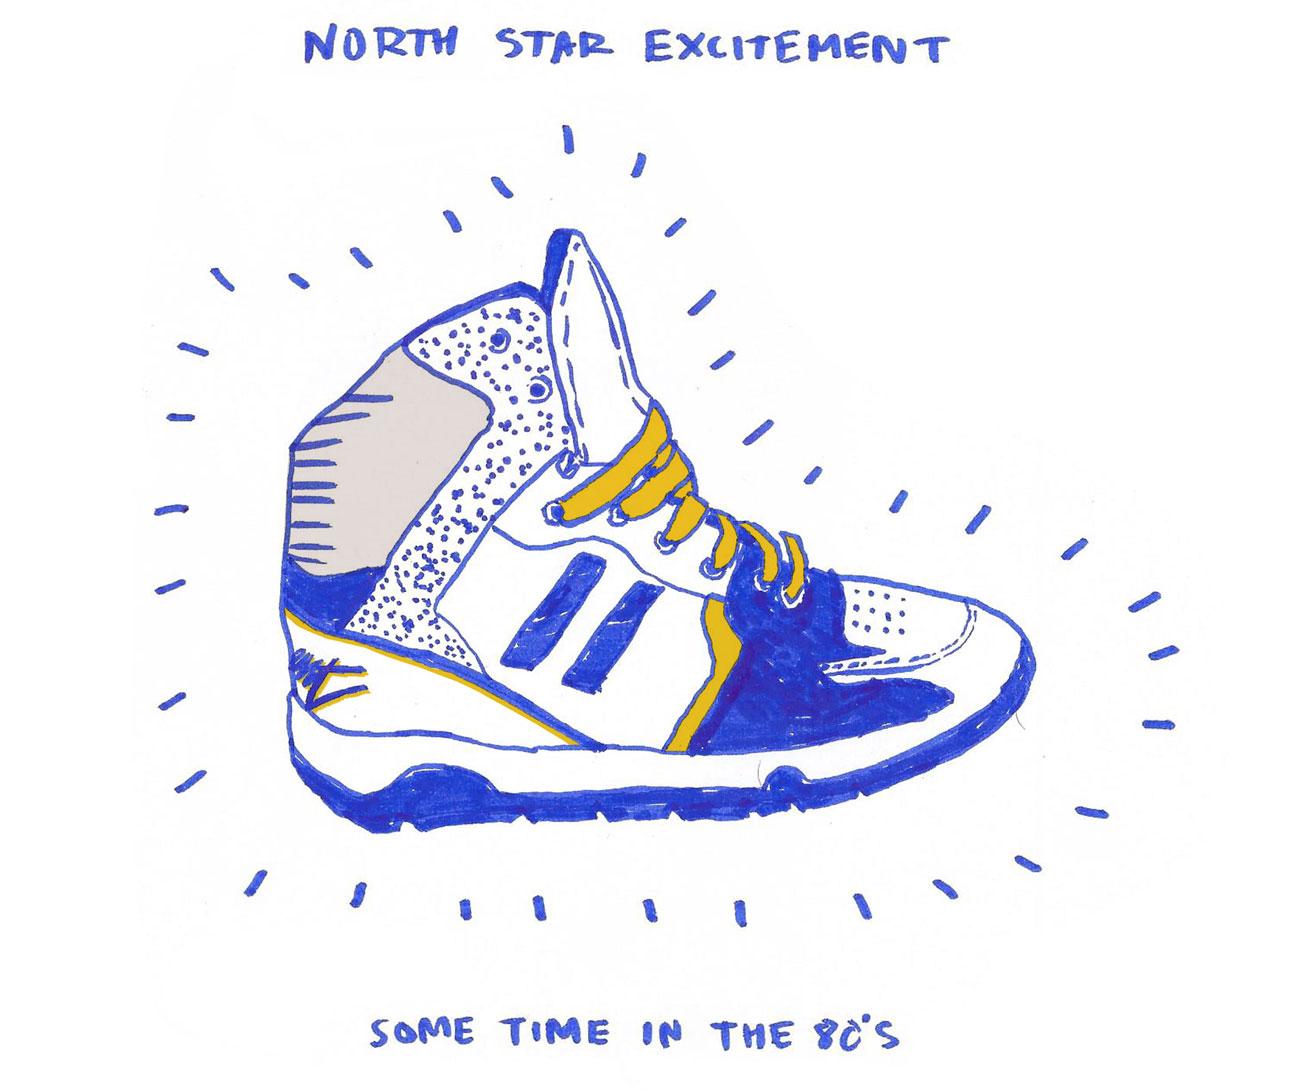 North star web